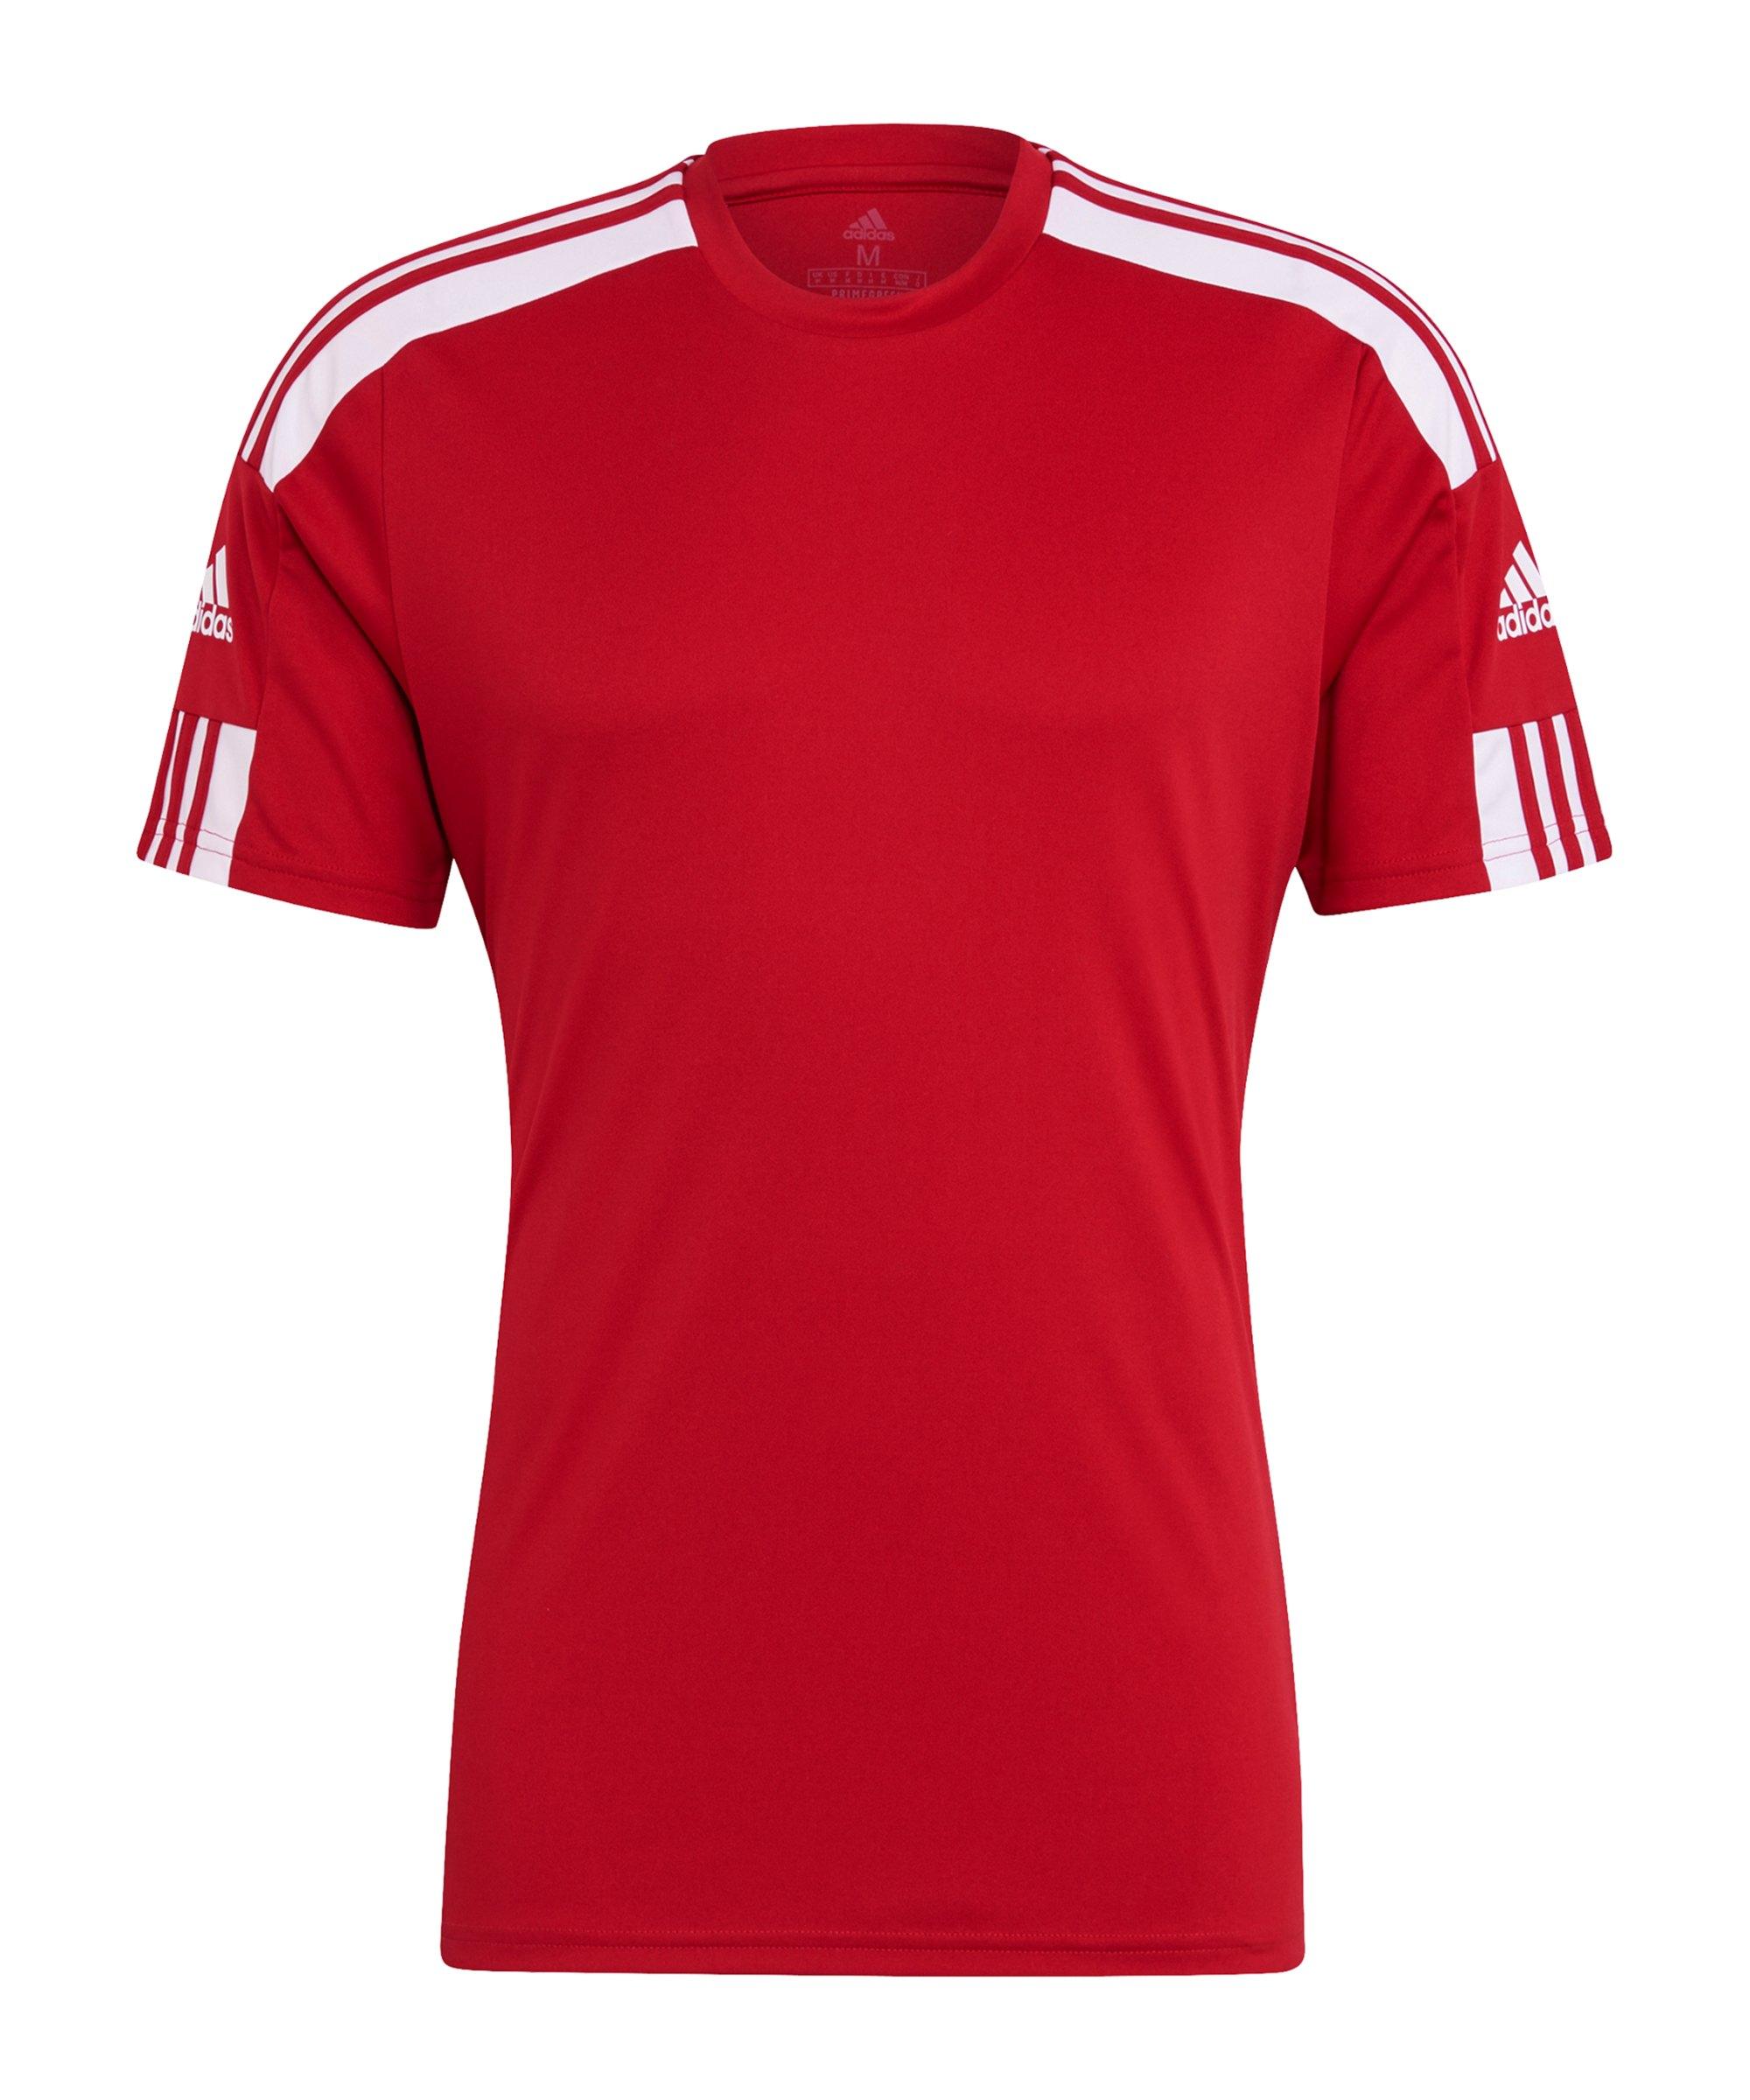 adidas Squadra 21 Trikot Rot Weiss - rot